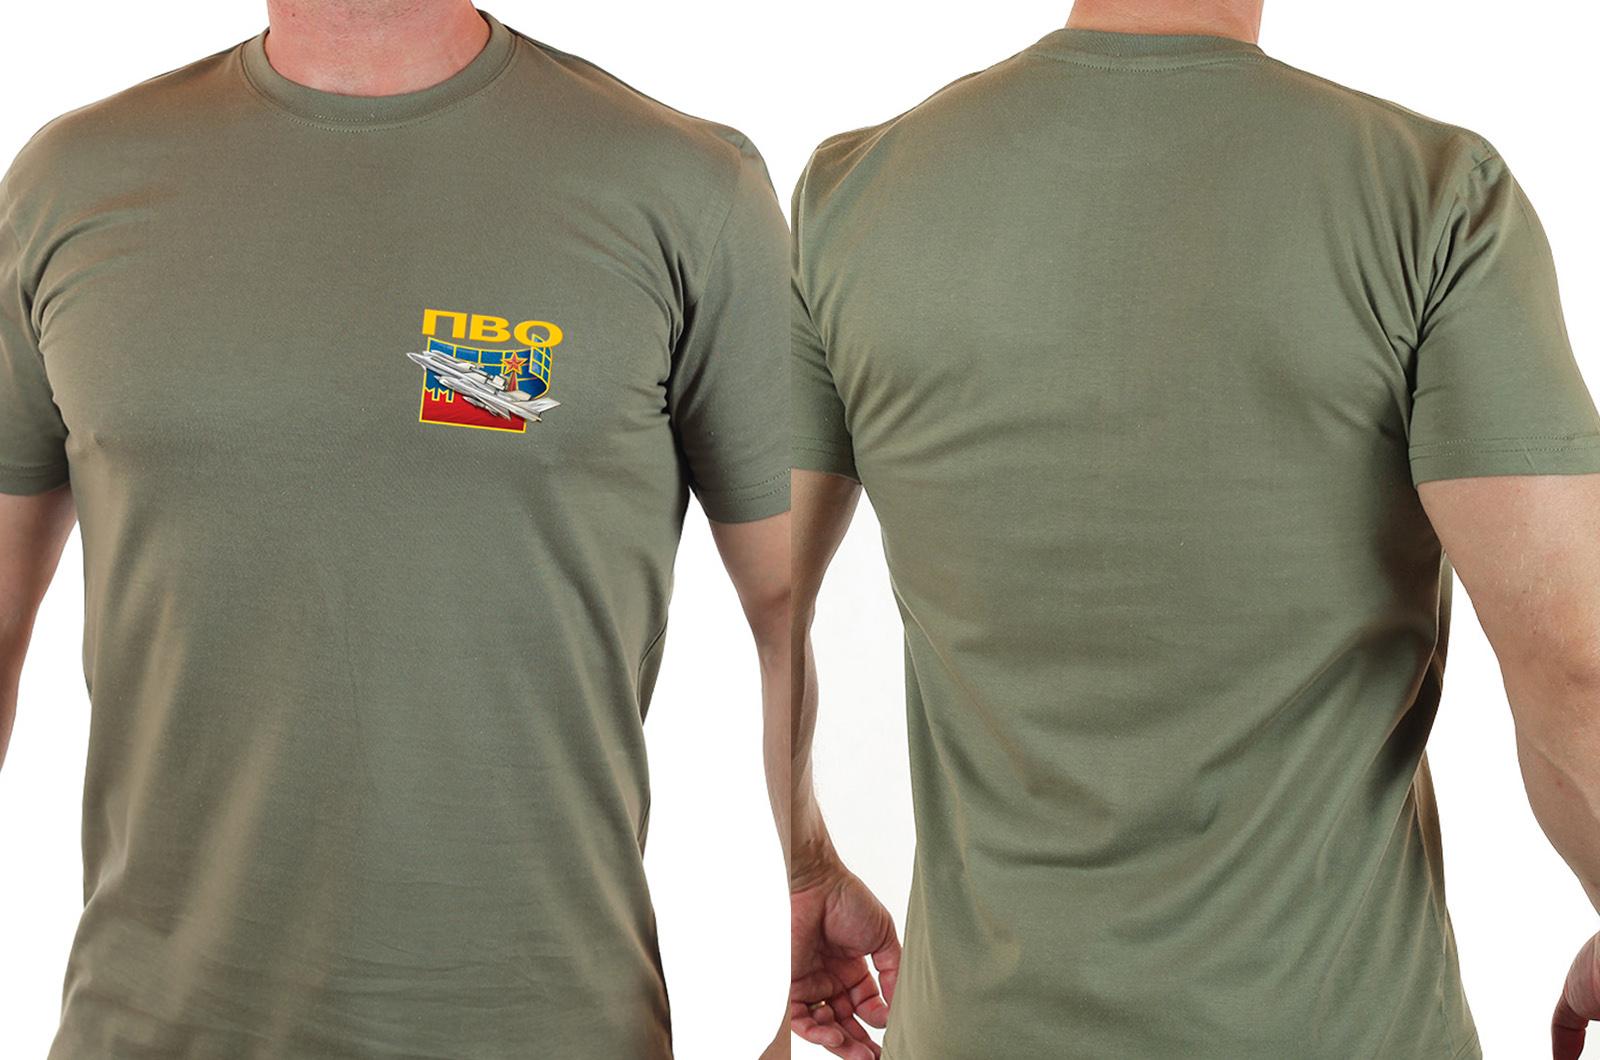 На страже неба! Мужская футболка-классика ПВО.